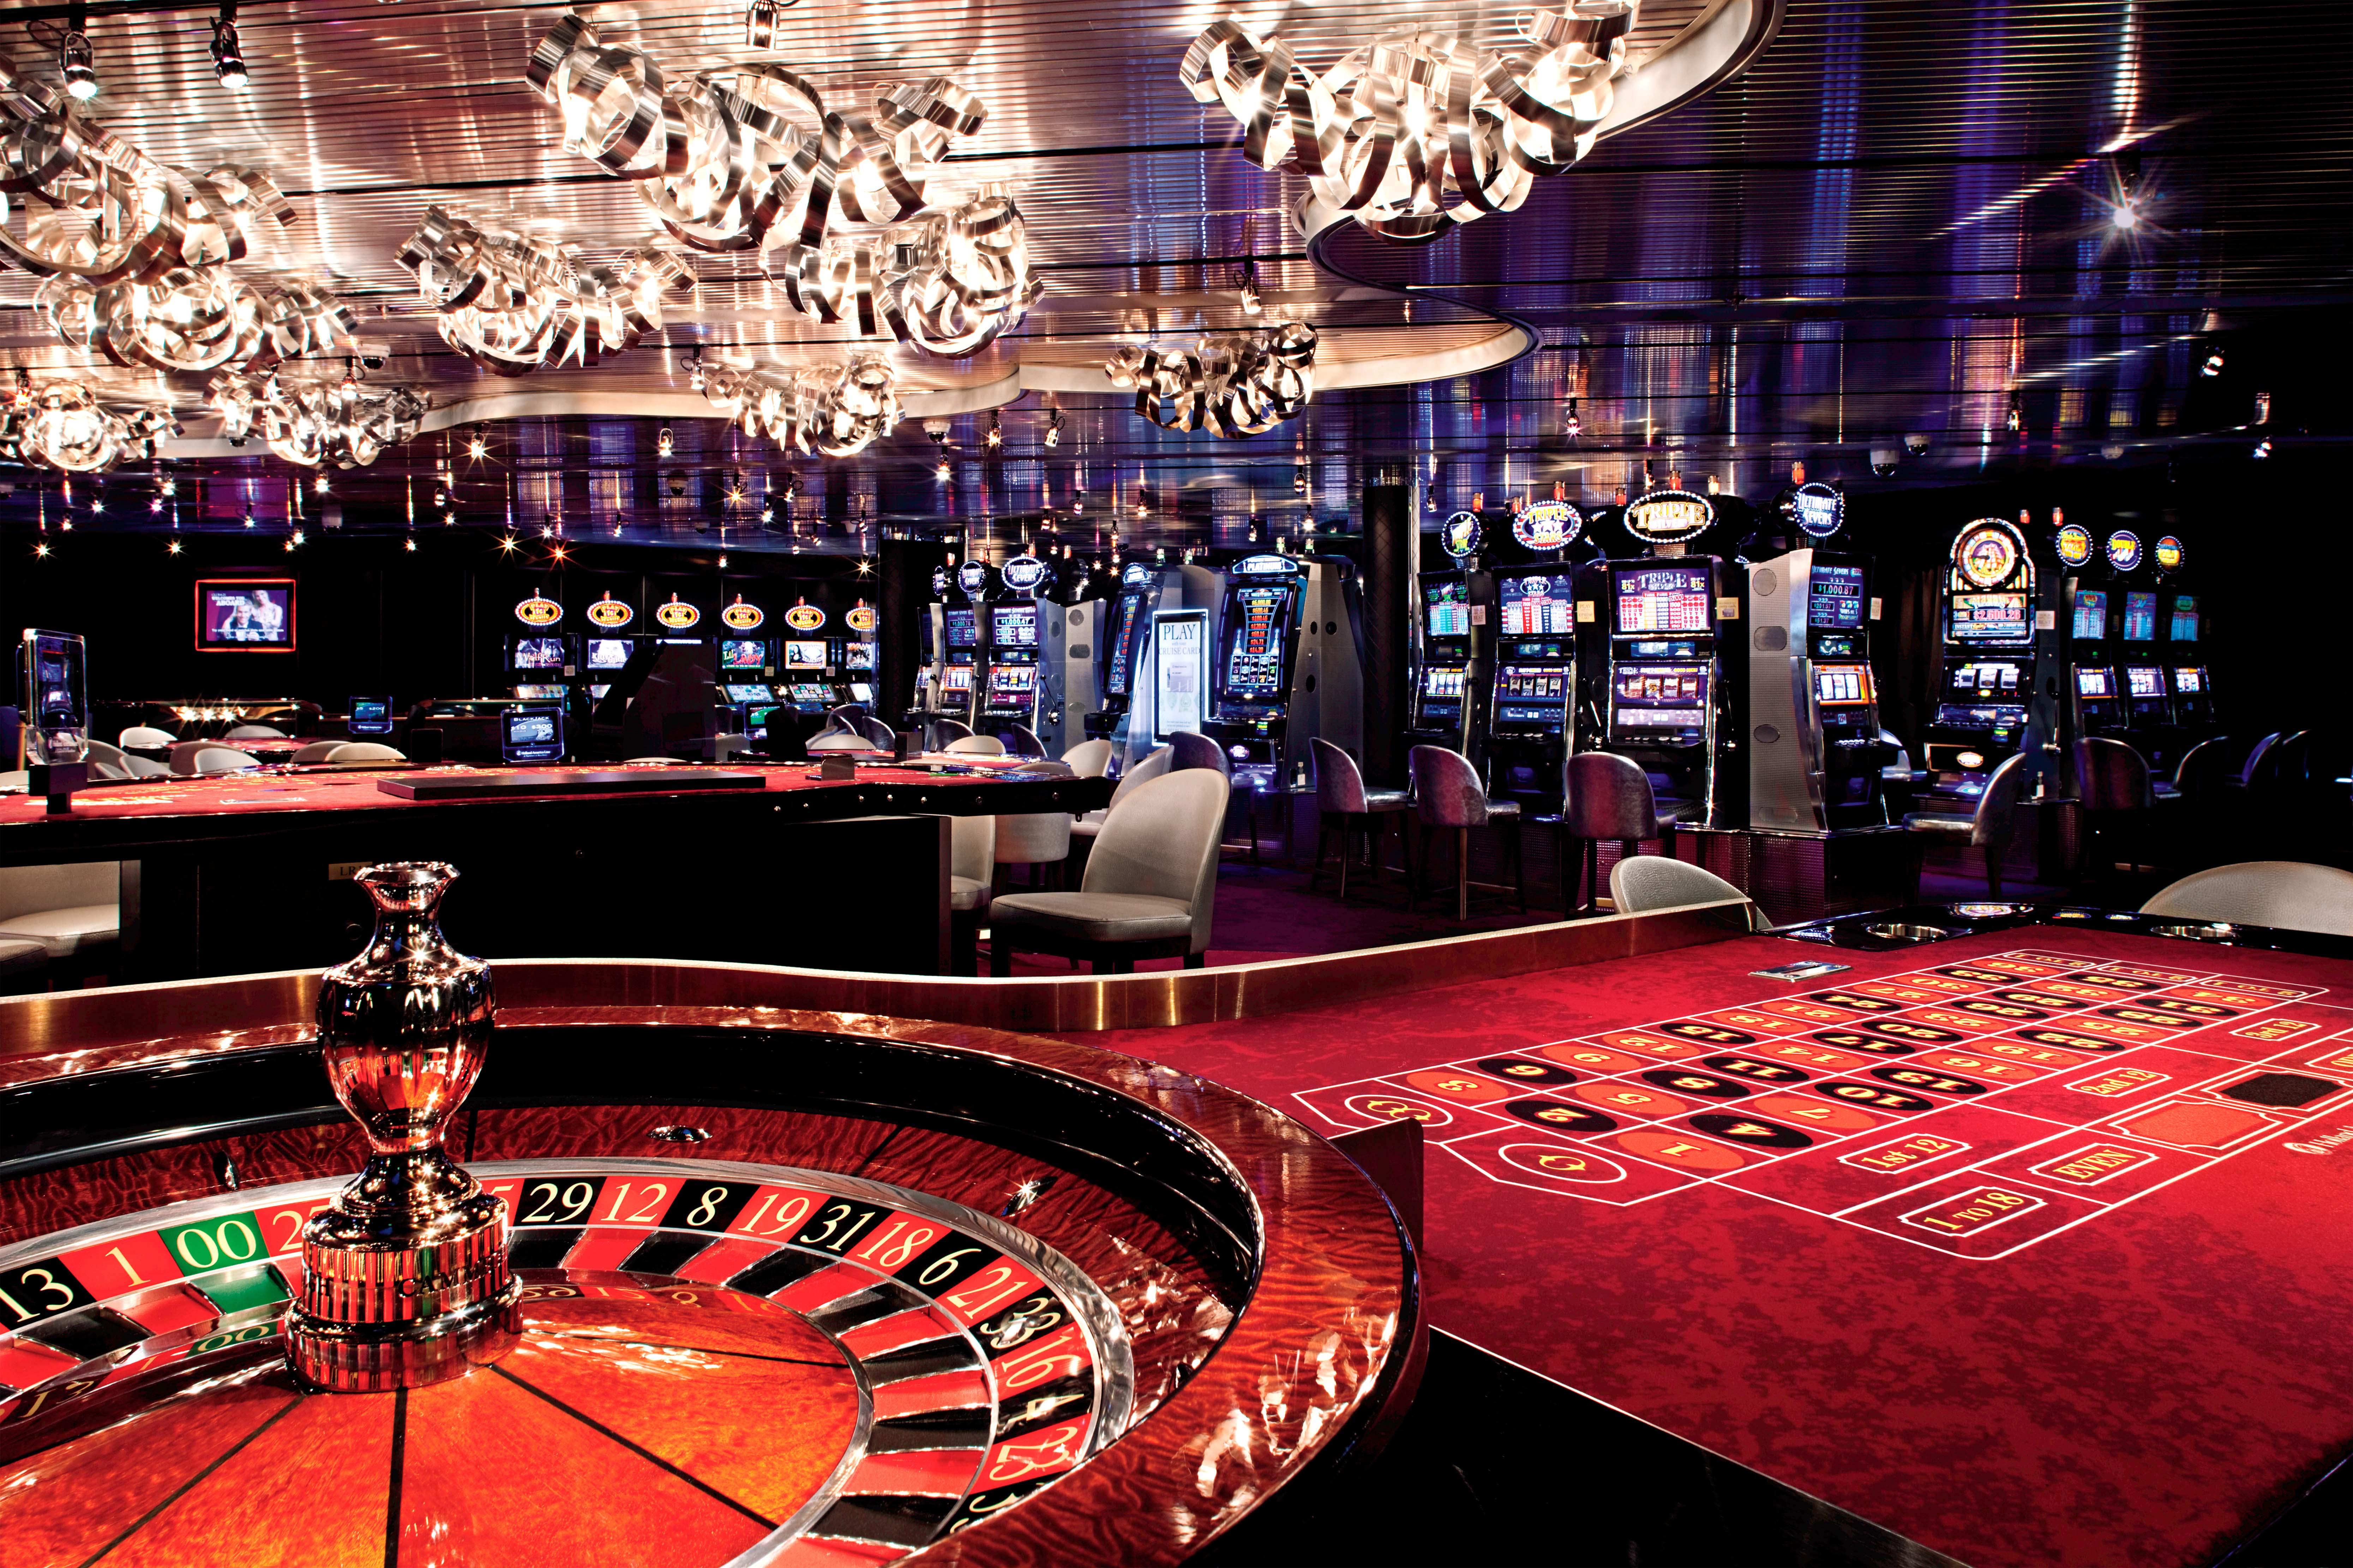 Top 10 casino games | GamerLimit